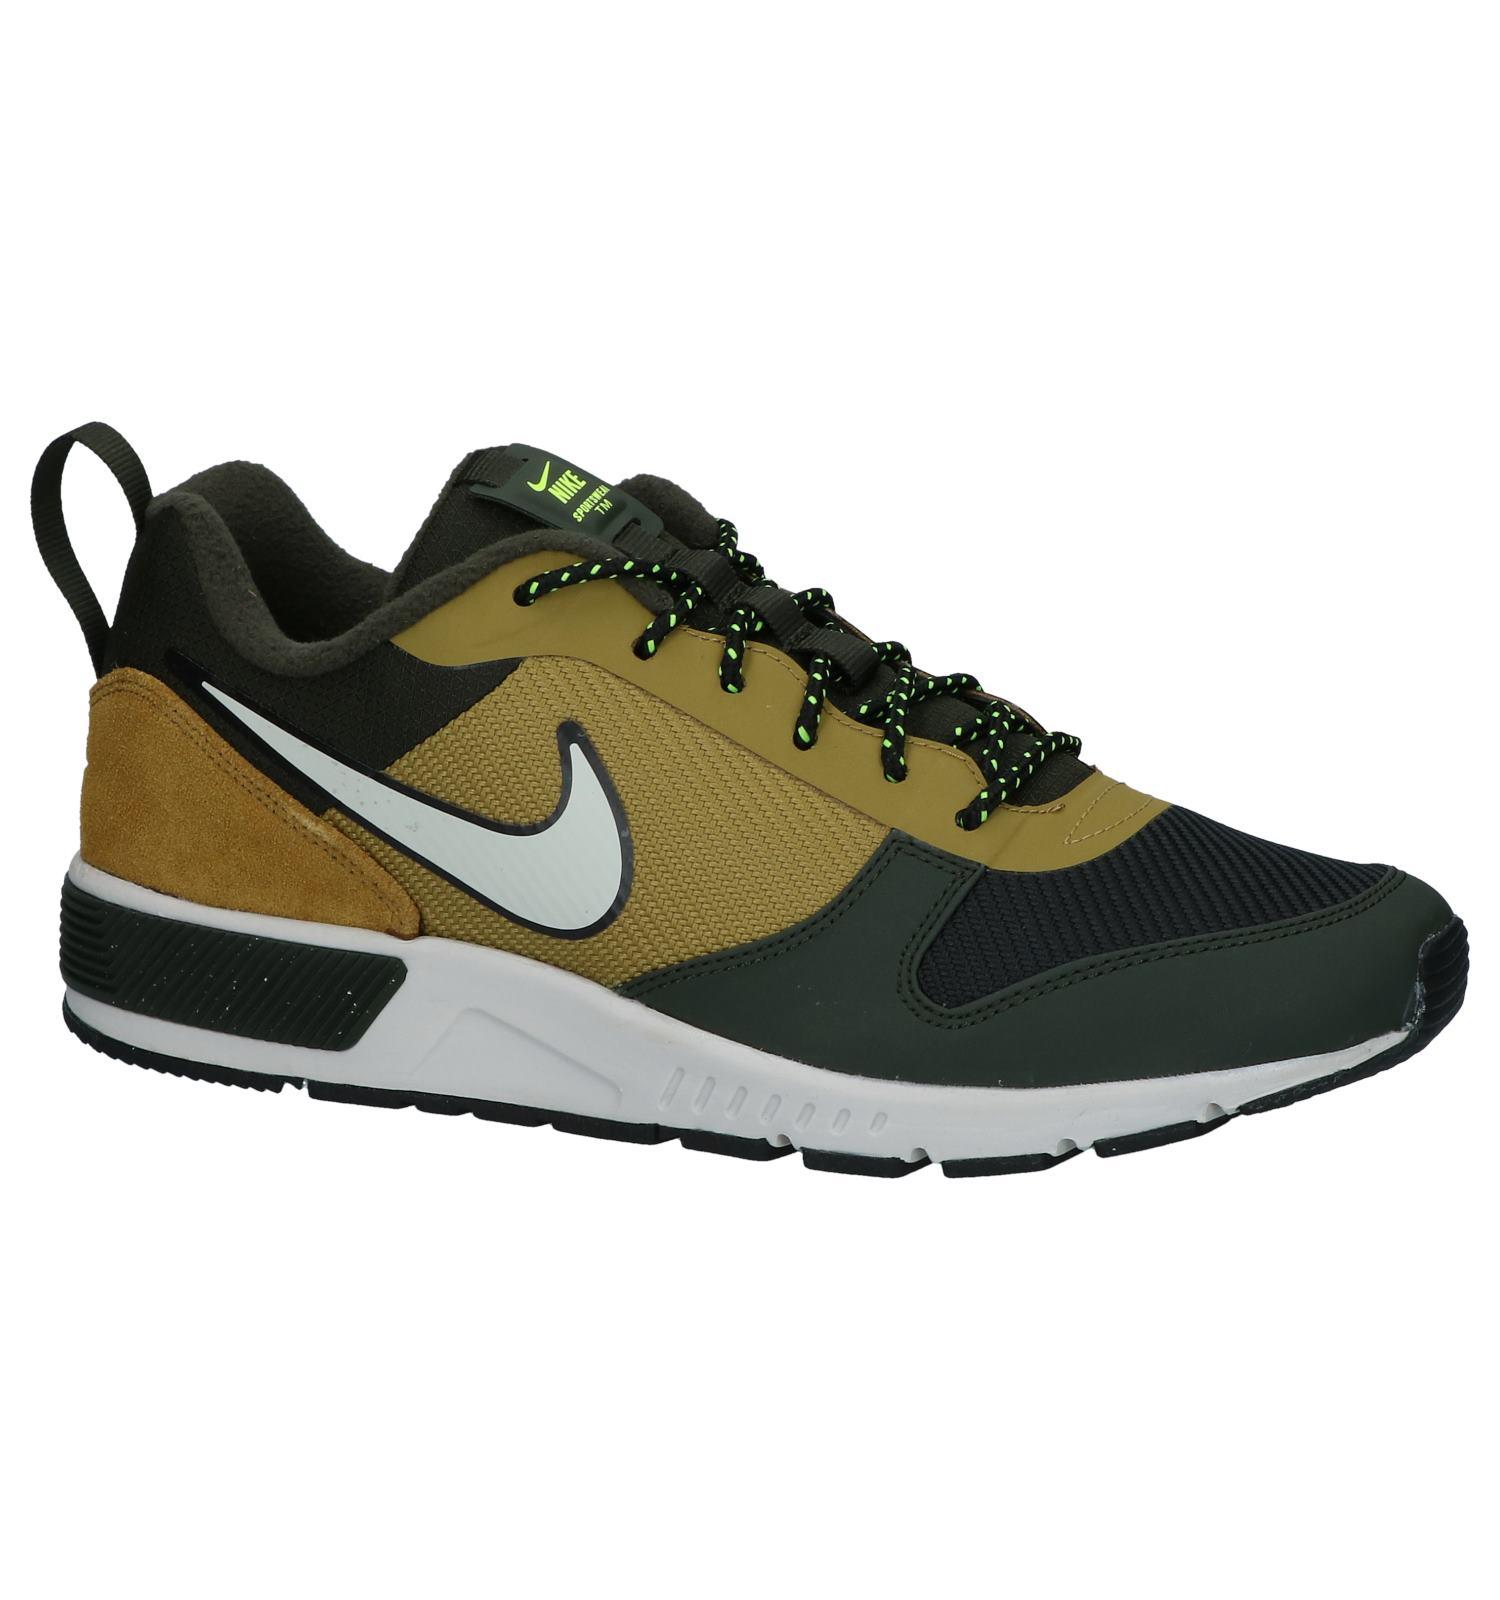 9b81b69fc6d Multicolor Nike Nightgazer Trail Sneakers | TORFS.BE | Gratis verzend en  retour